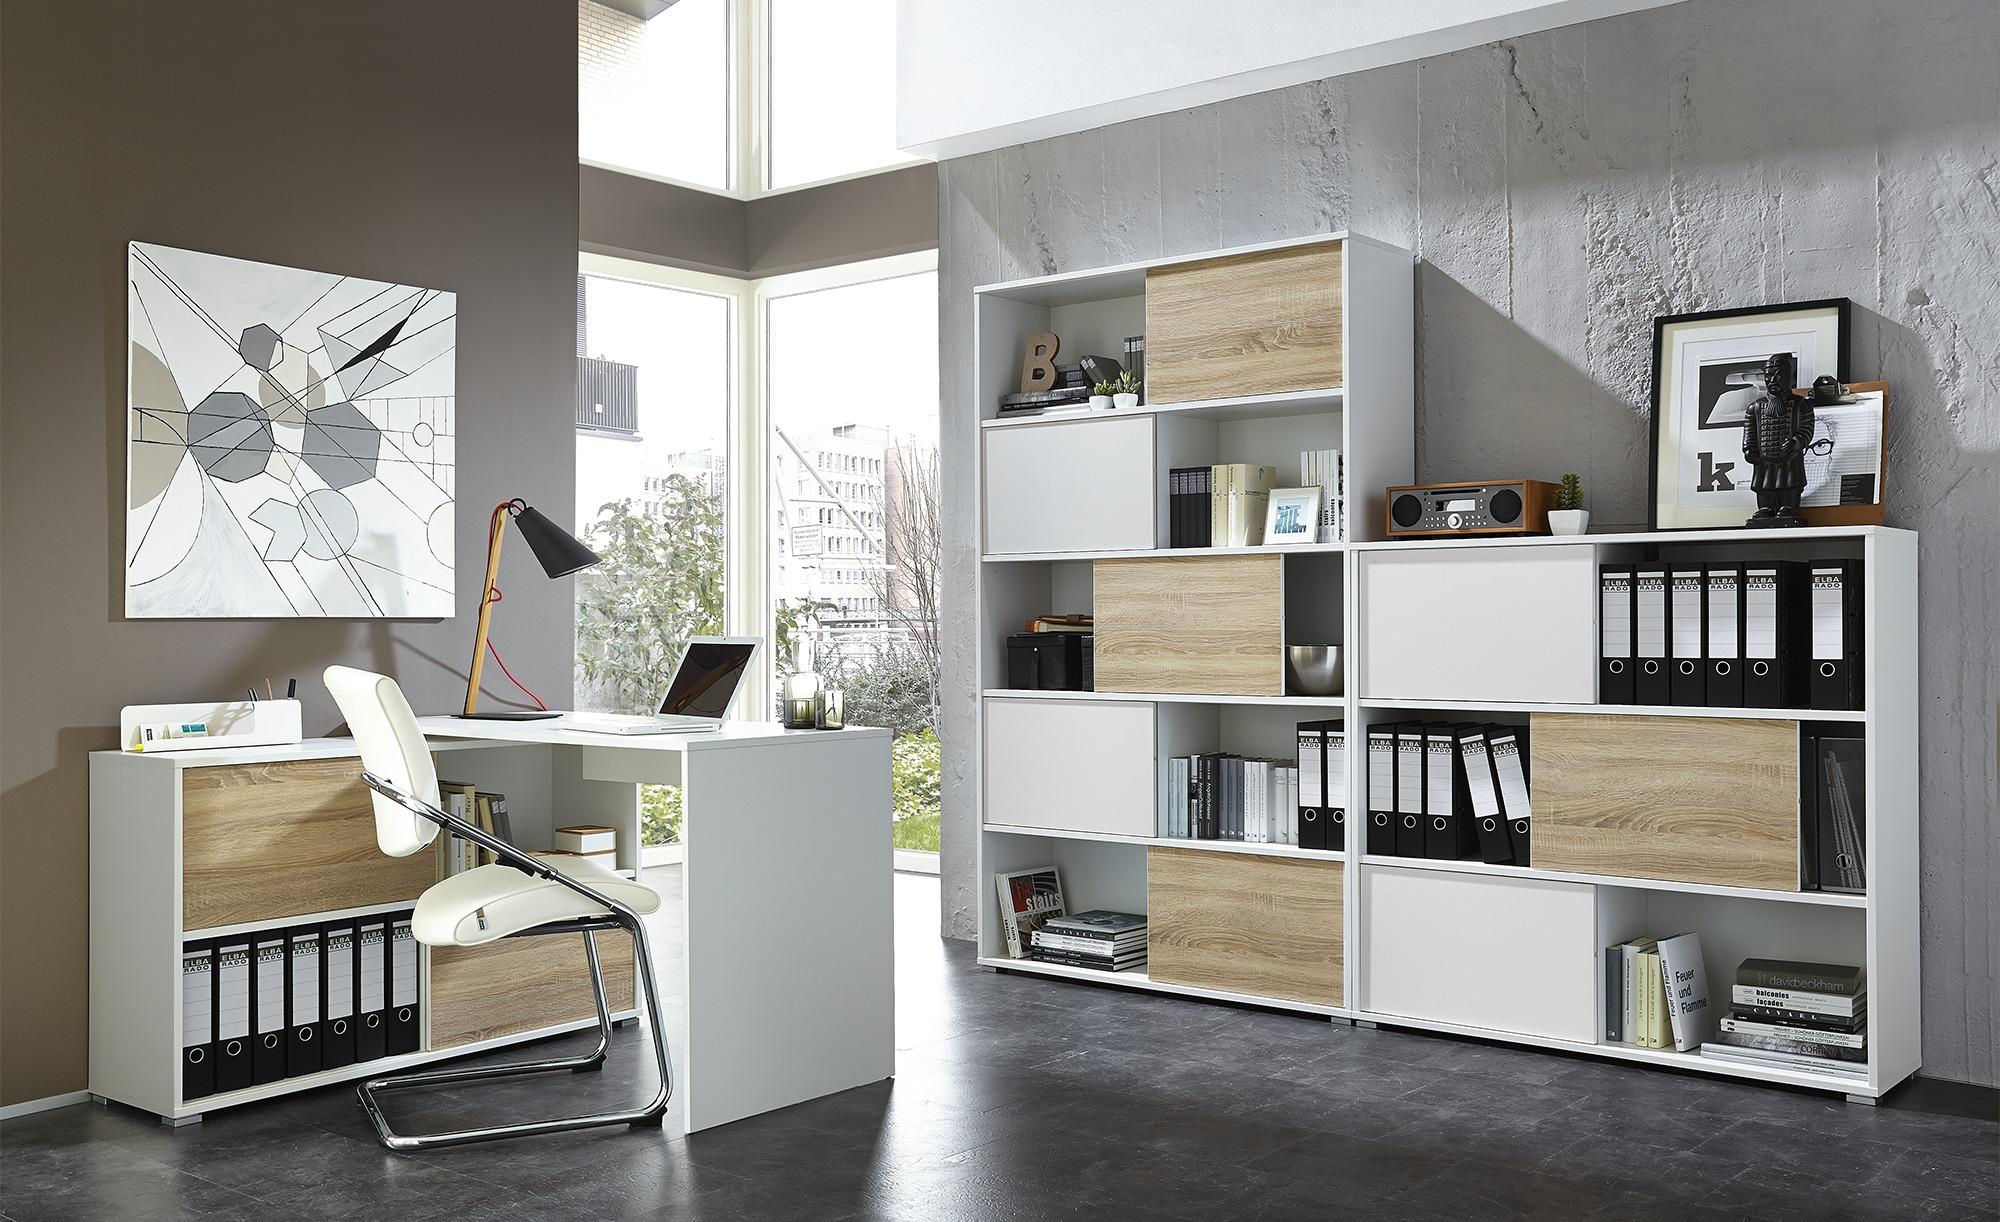 Büro 3 teilig, gefunden bei Möbel Kraft